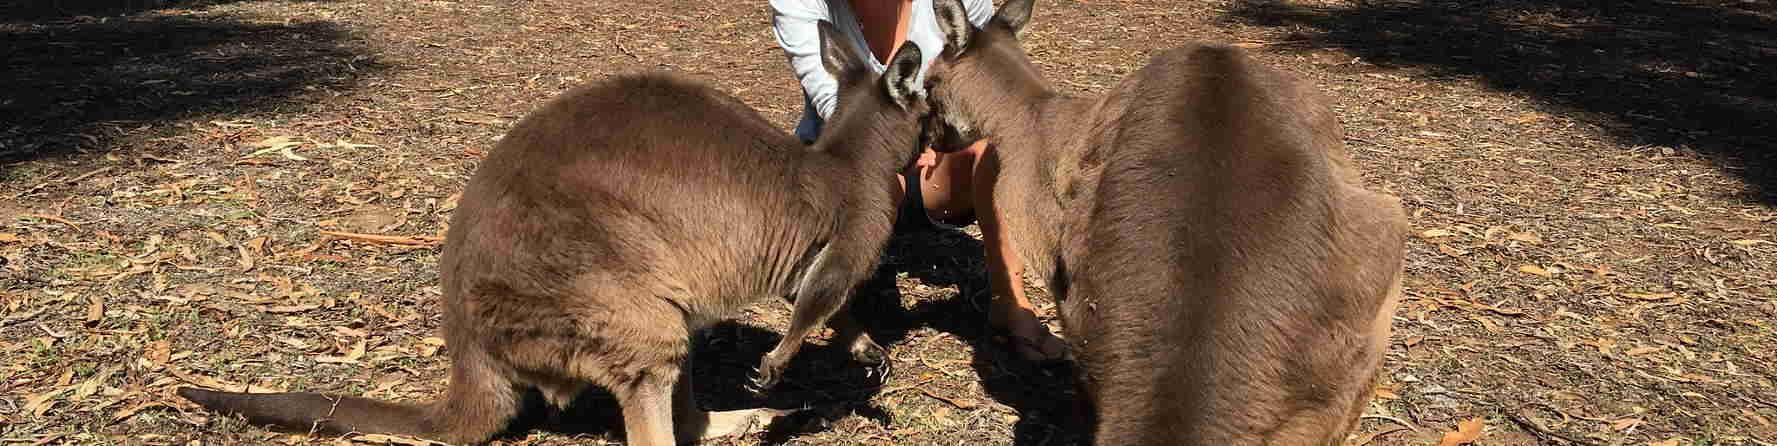 What Animals are on Kangaroo Island?